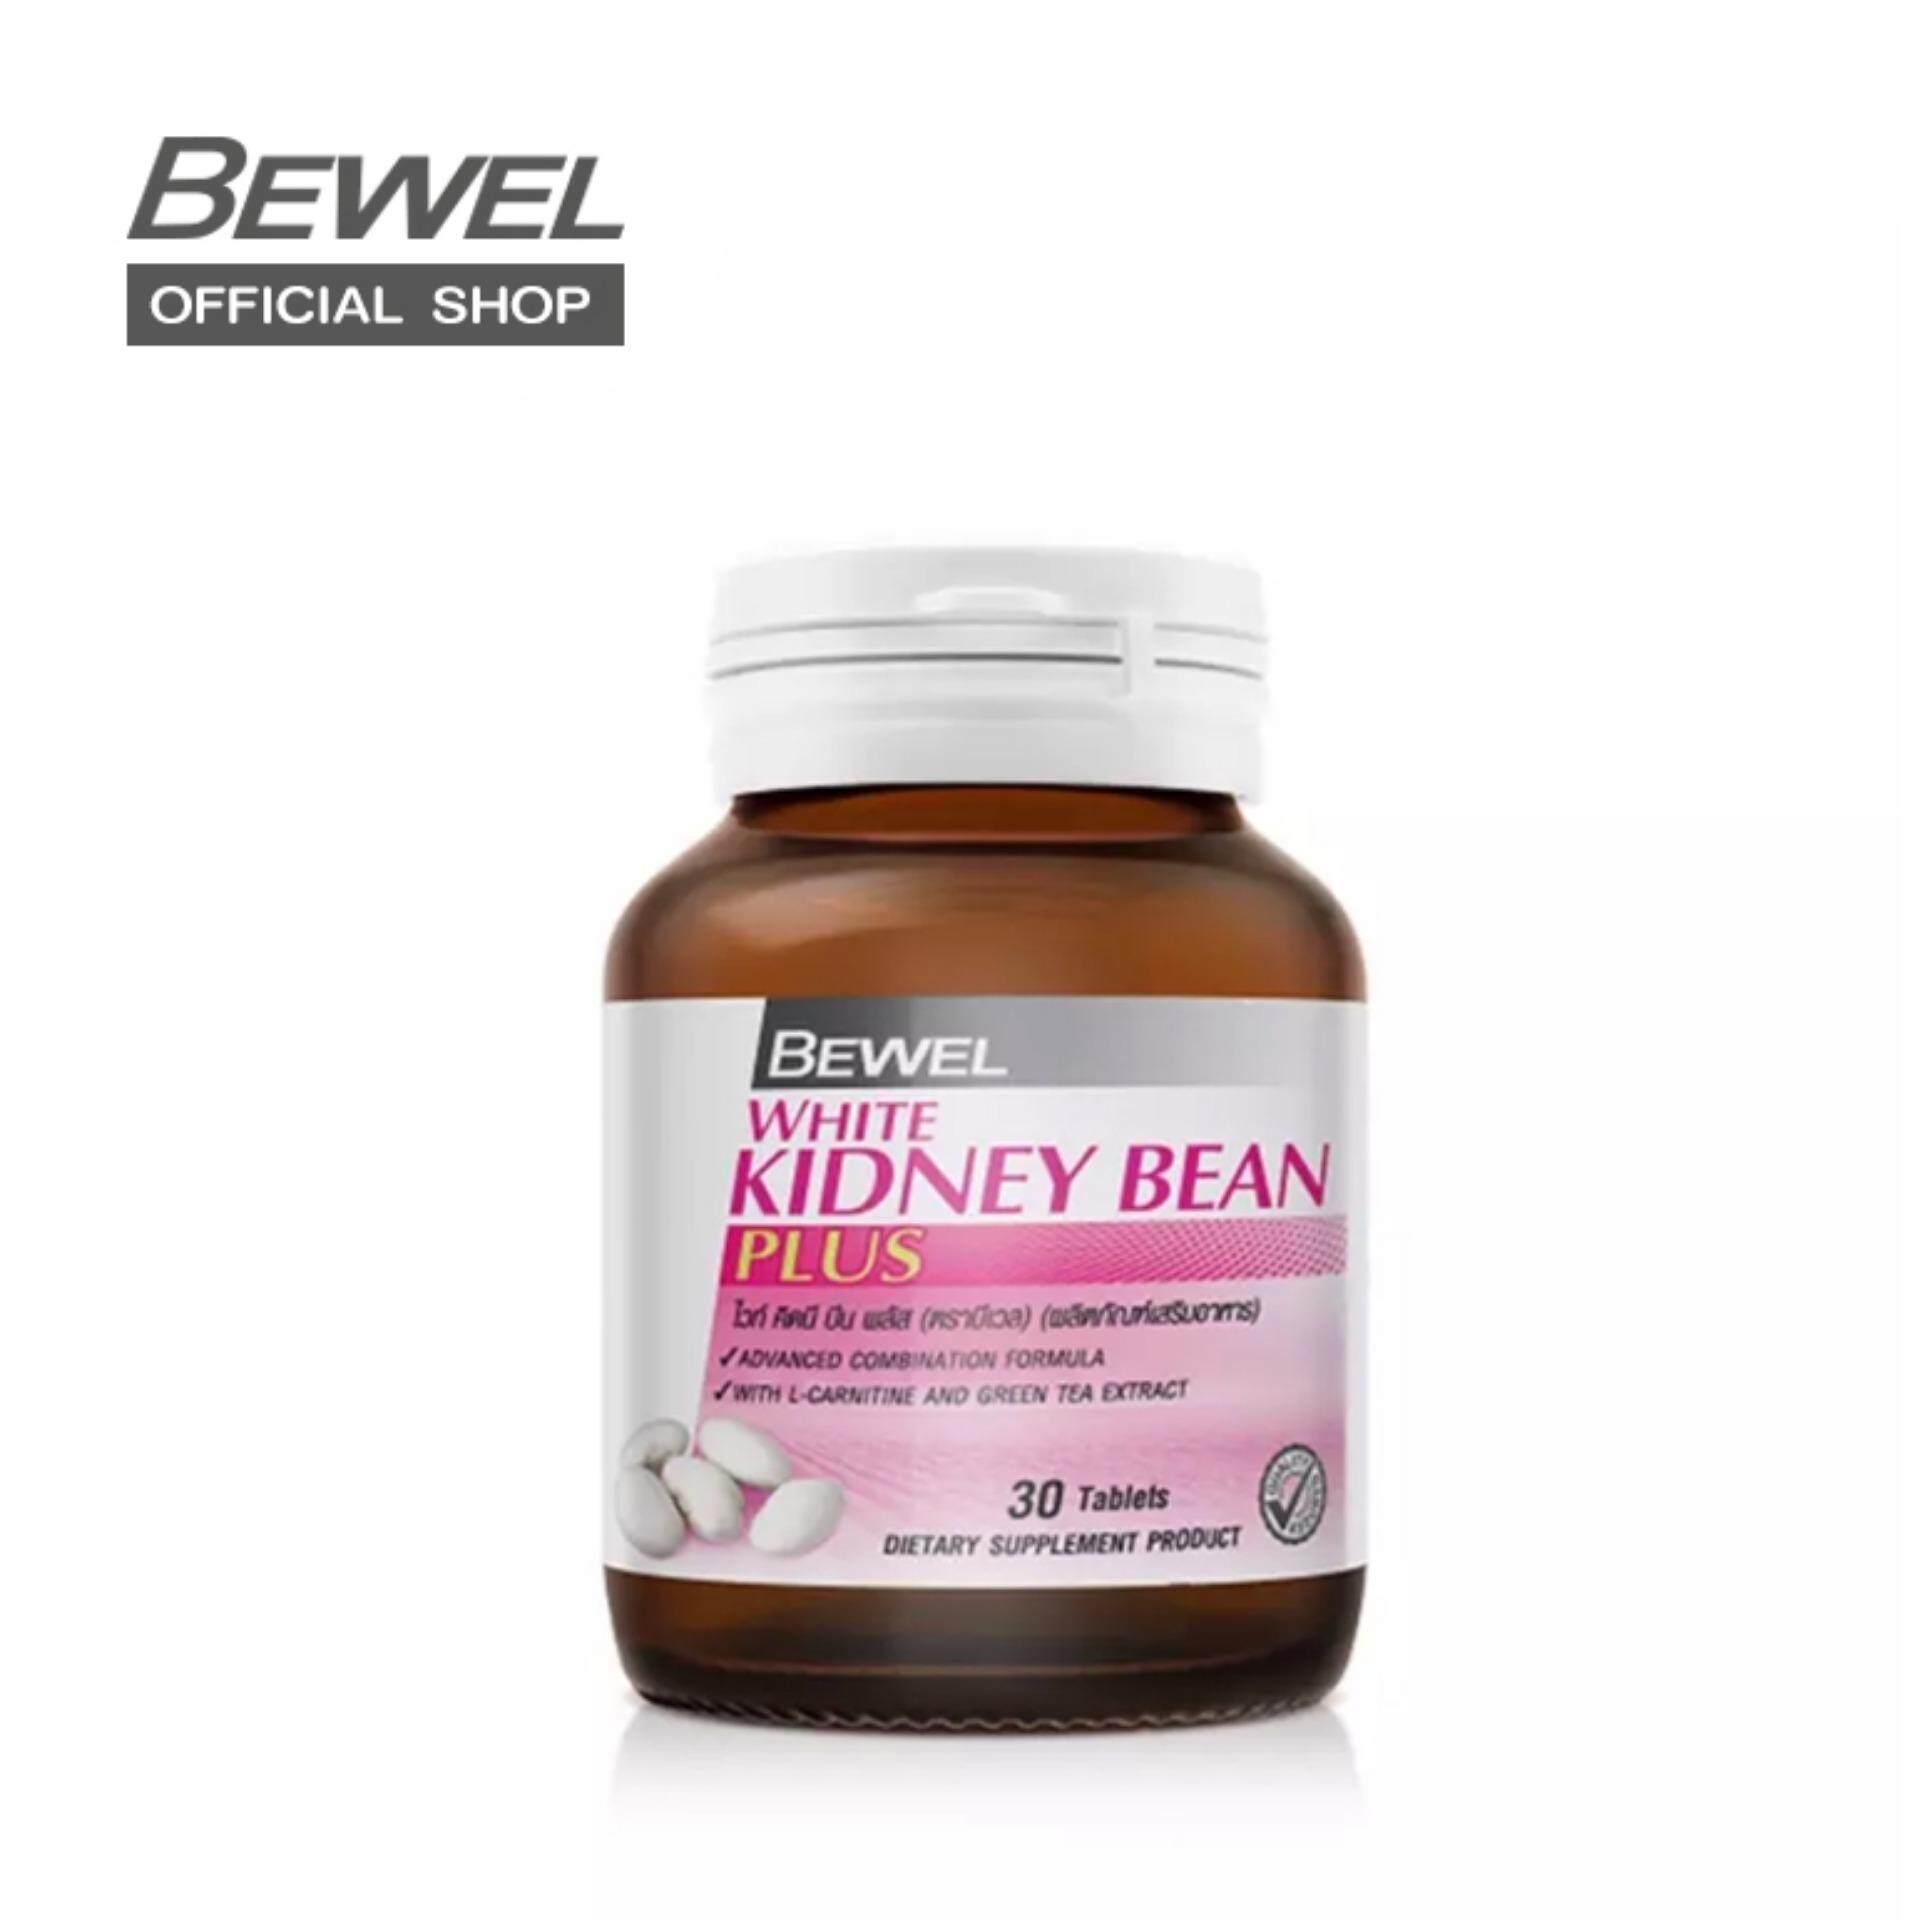 Bewel White Kidney Bean Plus (30 Caps) By Vistra Thailand